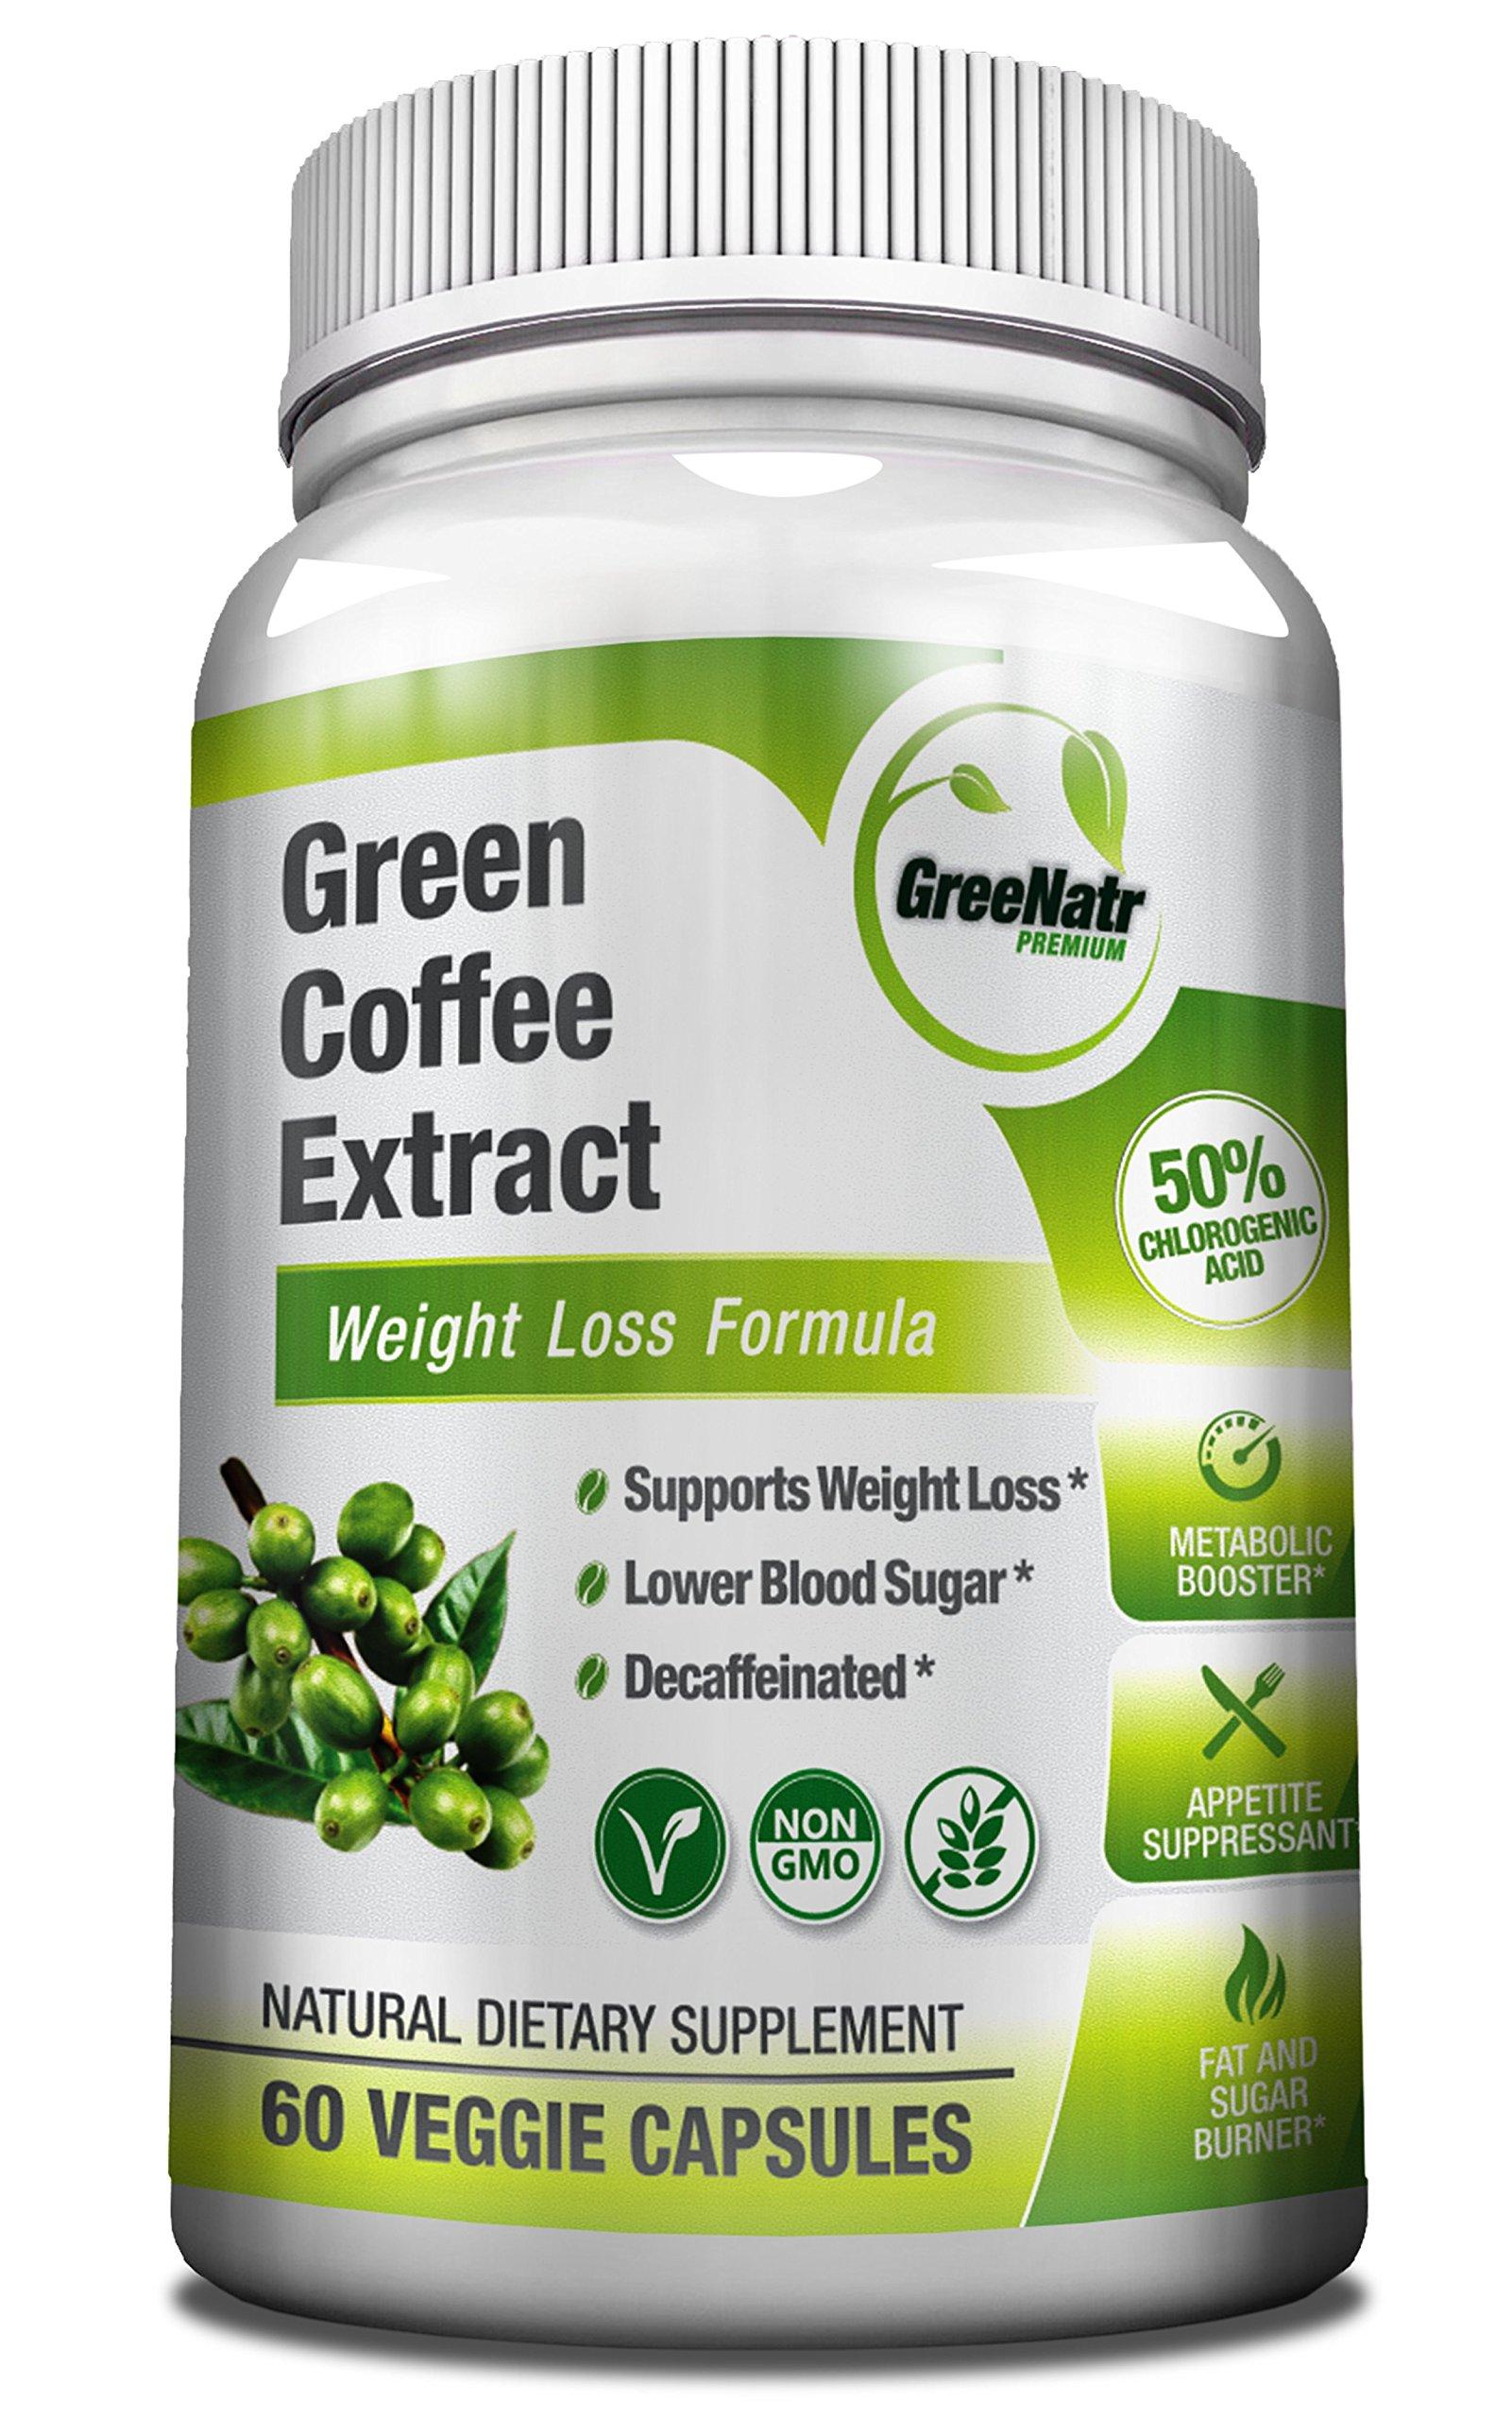 GreeNatr Premium Pure Green Coffee Bean Extract | Weight Management Pills, Appetite Suppressant, Energy Pills, Blood Sugar Control Support | 60 Capsules, Gluten-Free, Non-GMO, 50% Chlorogenic Acids by GreeNatr